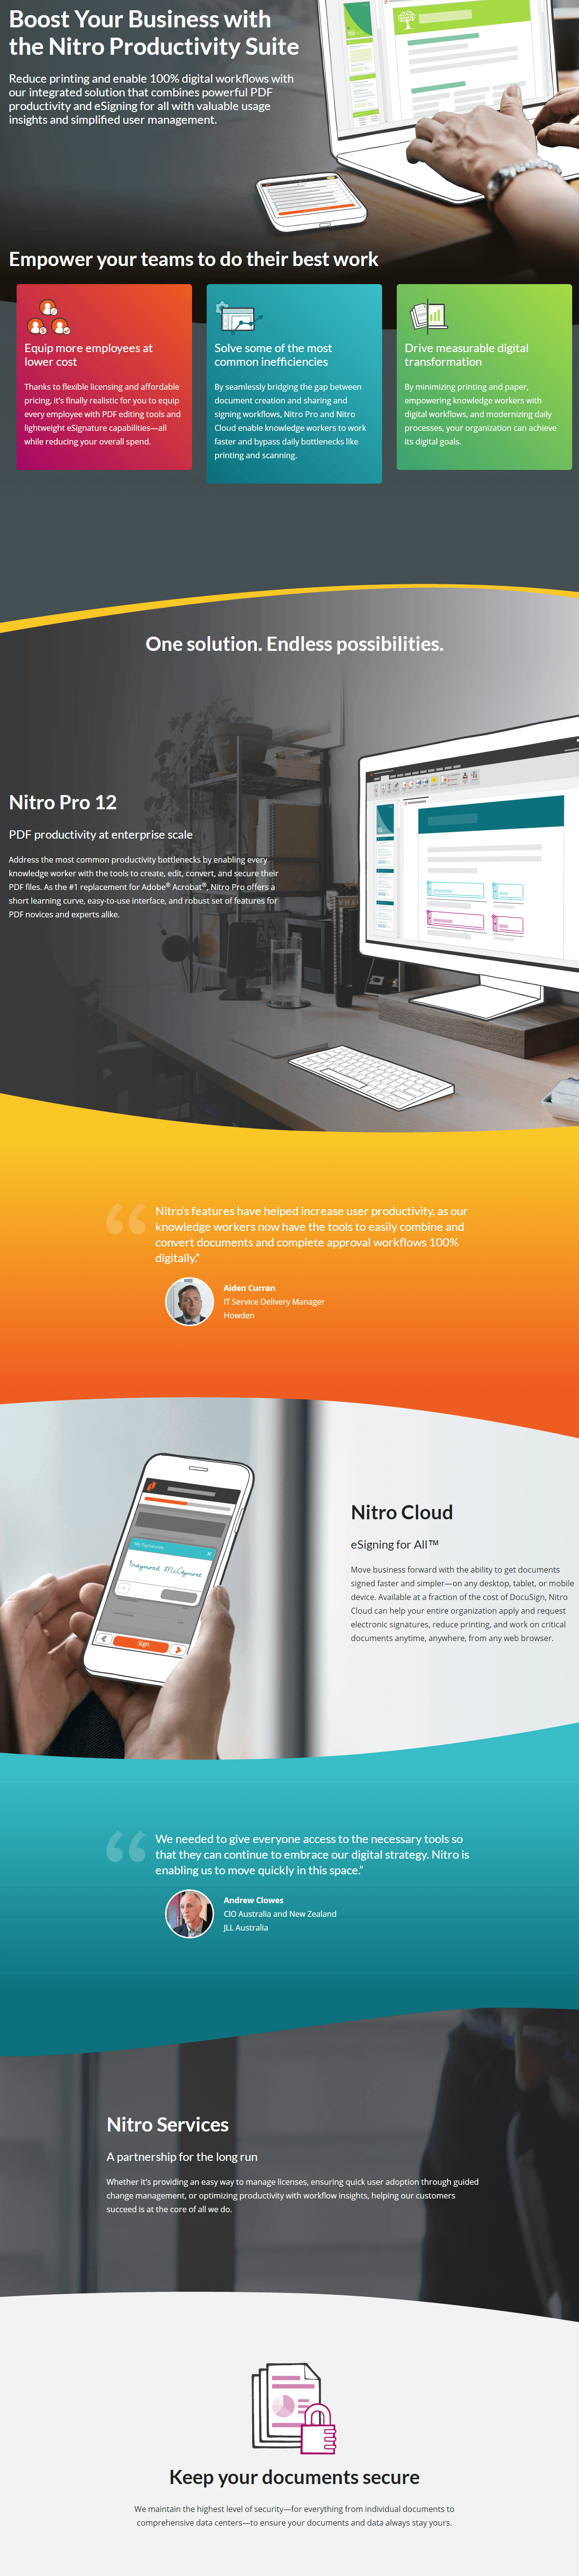 Nitro Productivity Suite 25% Discount